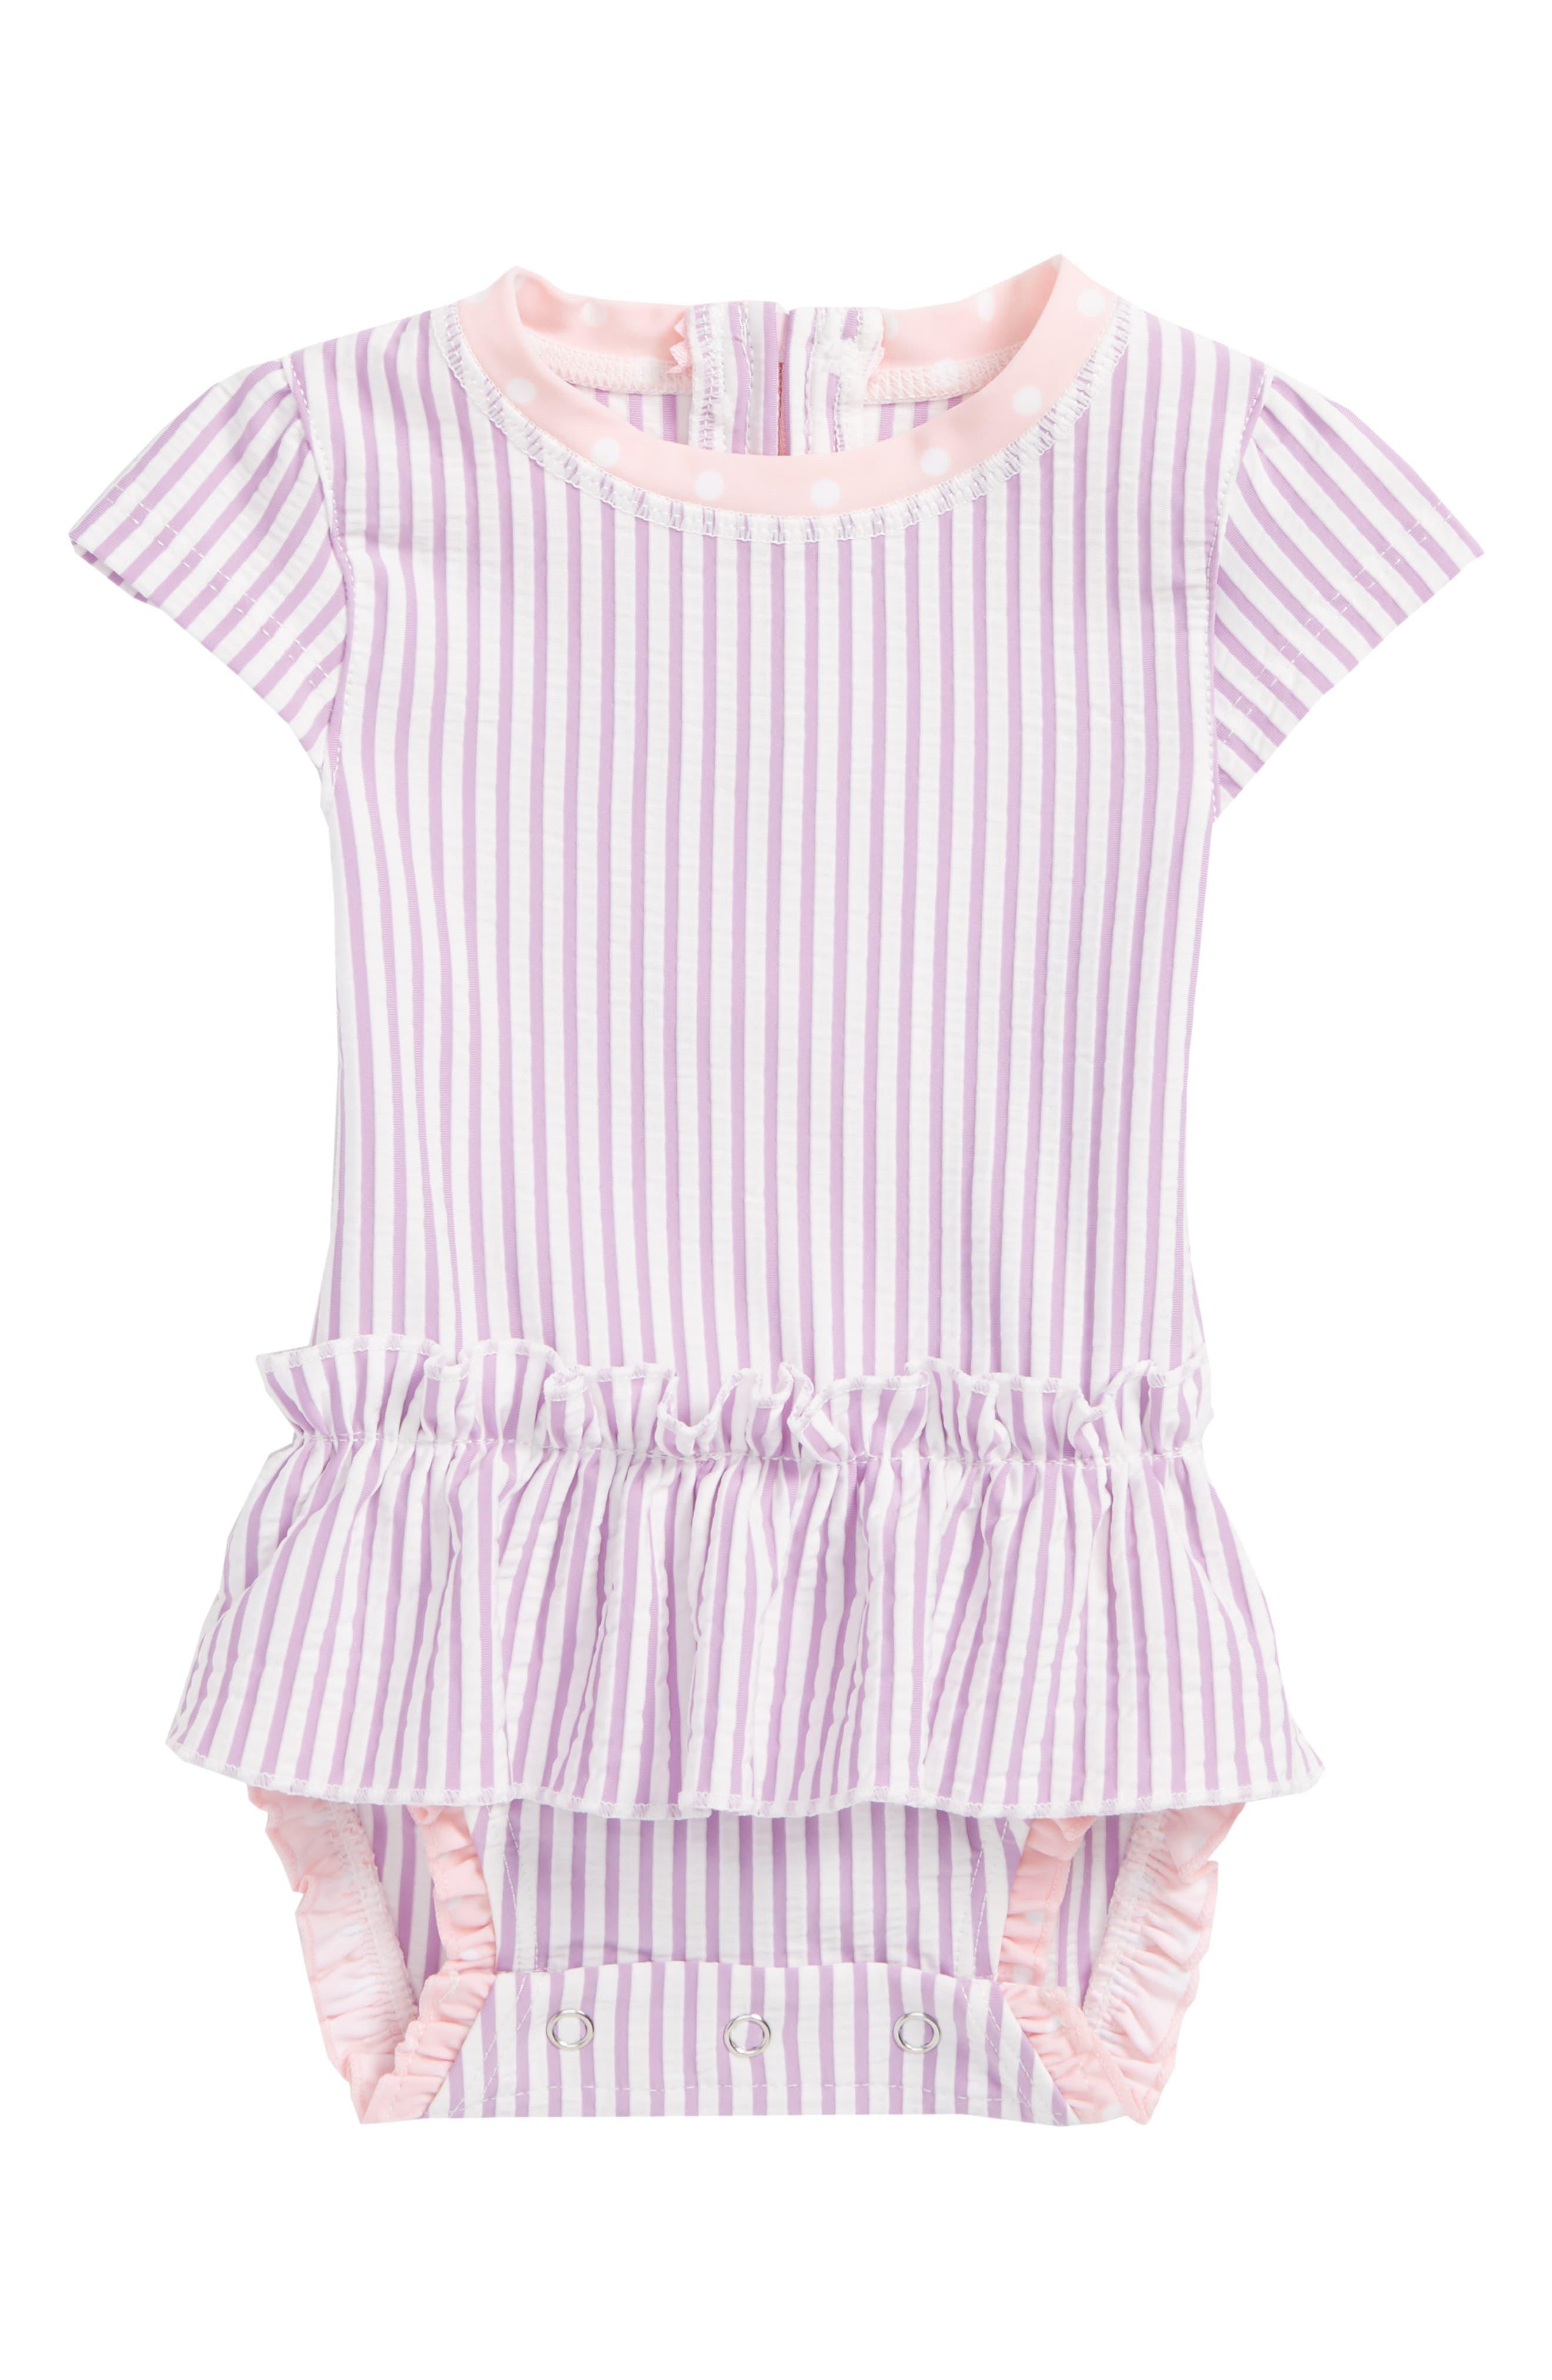 Lilac Peplum One-Piece Swimsuit,                             Main thumbnail 1, color,                             530